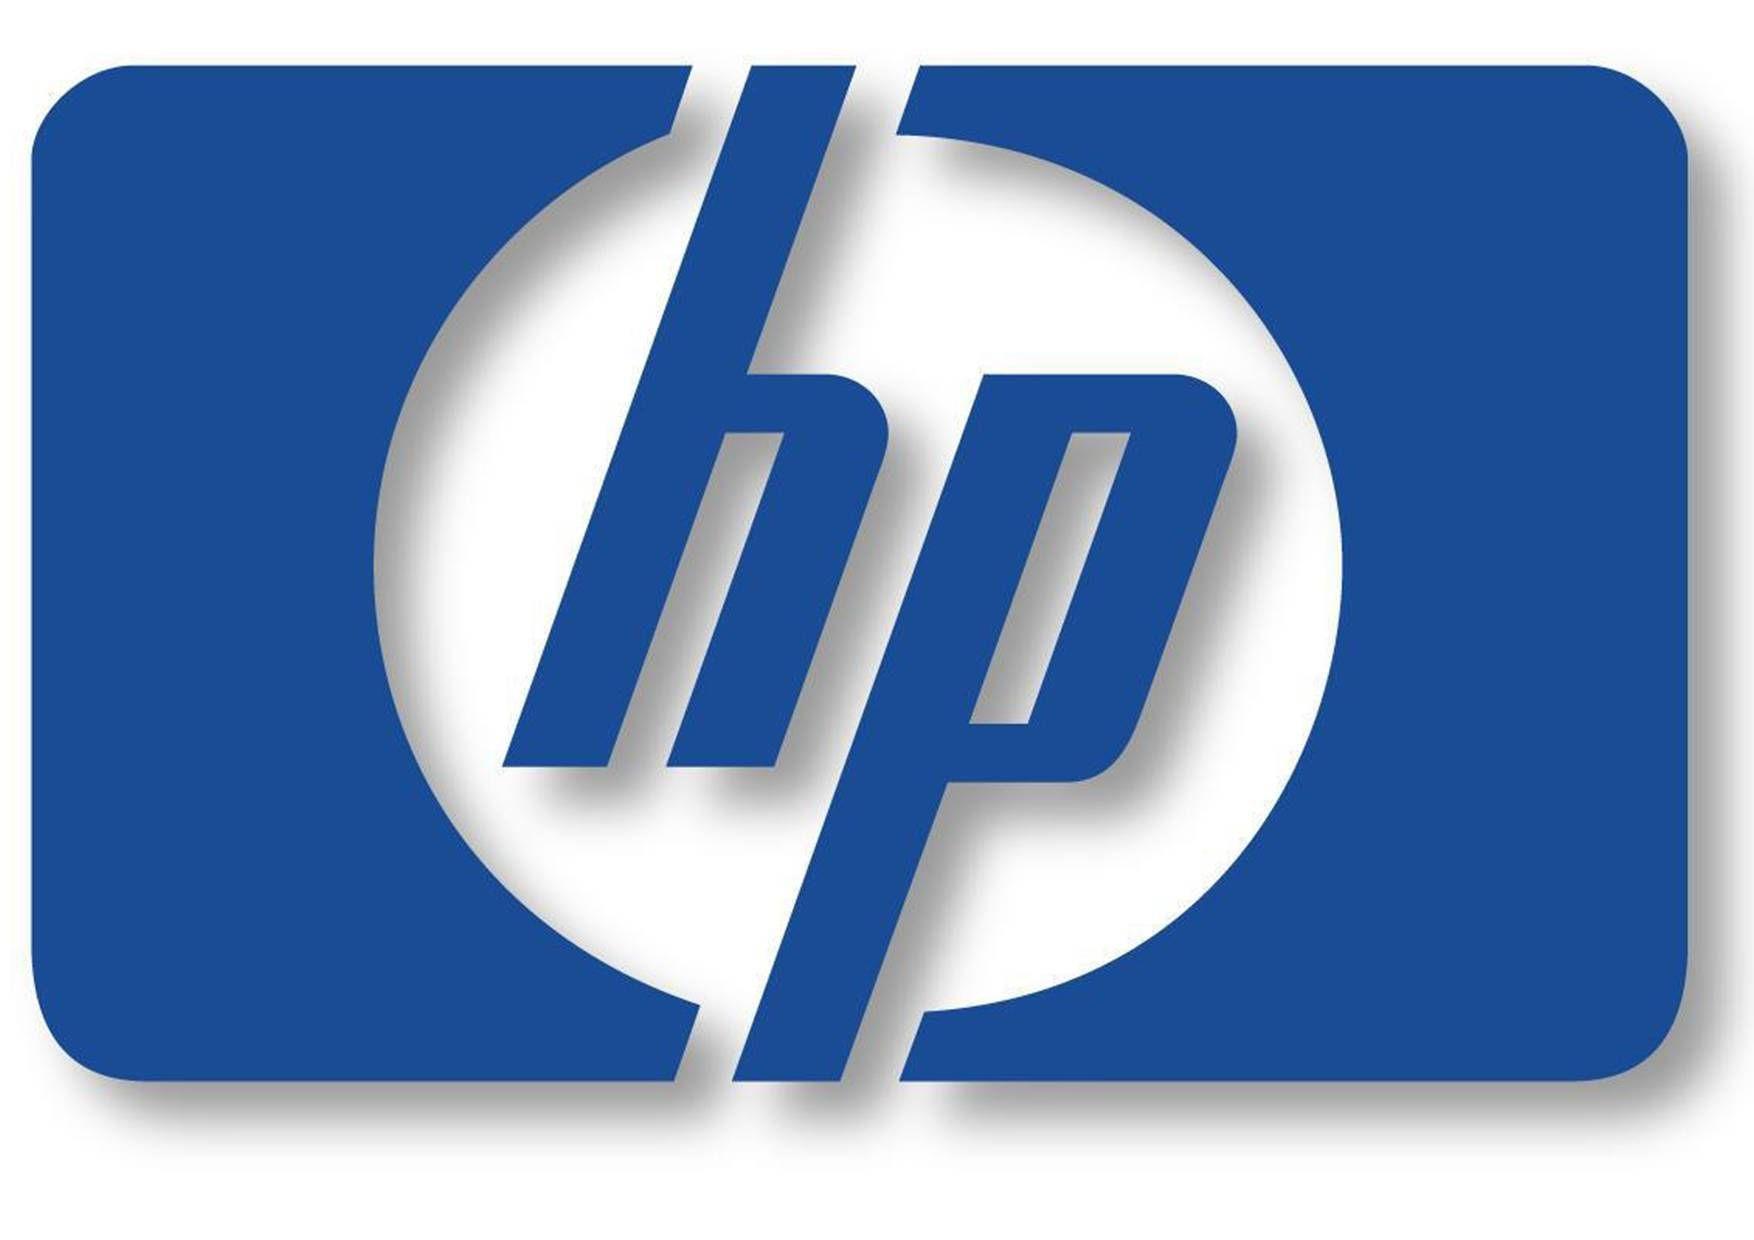 http://kinsellaconsultants.com/wp-content/uploads/2011/05/hp-logo.jpg | Hp logo, Hewlett packard logo, Famous logos